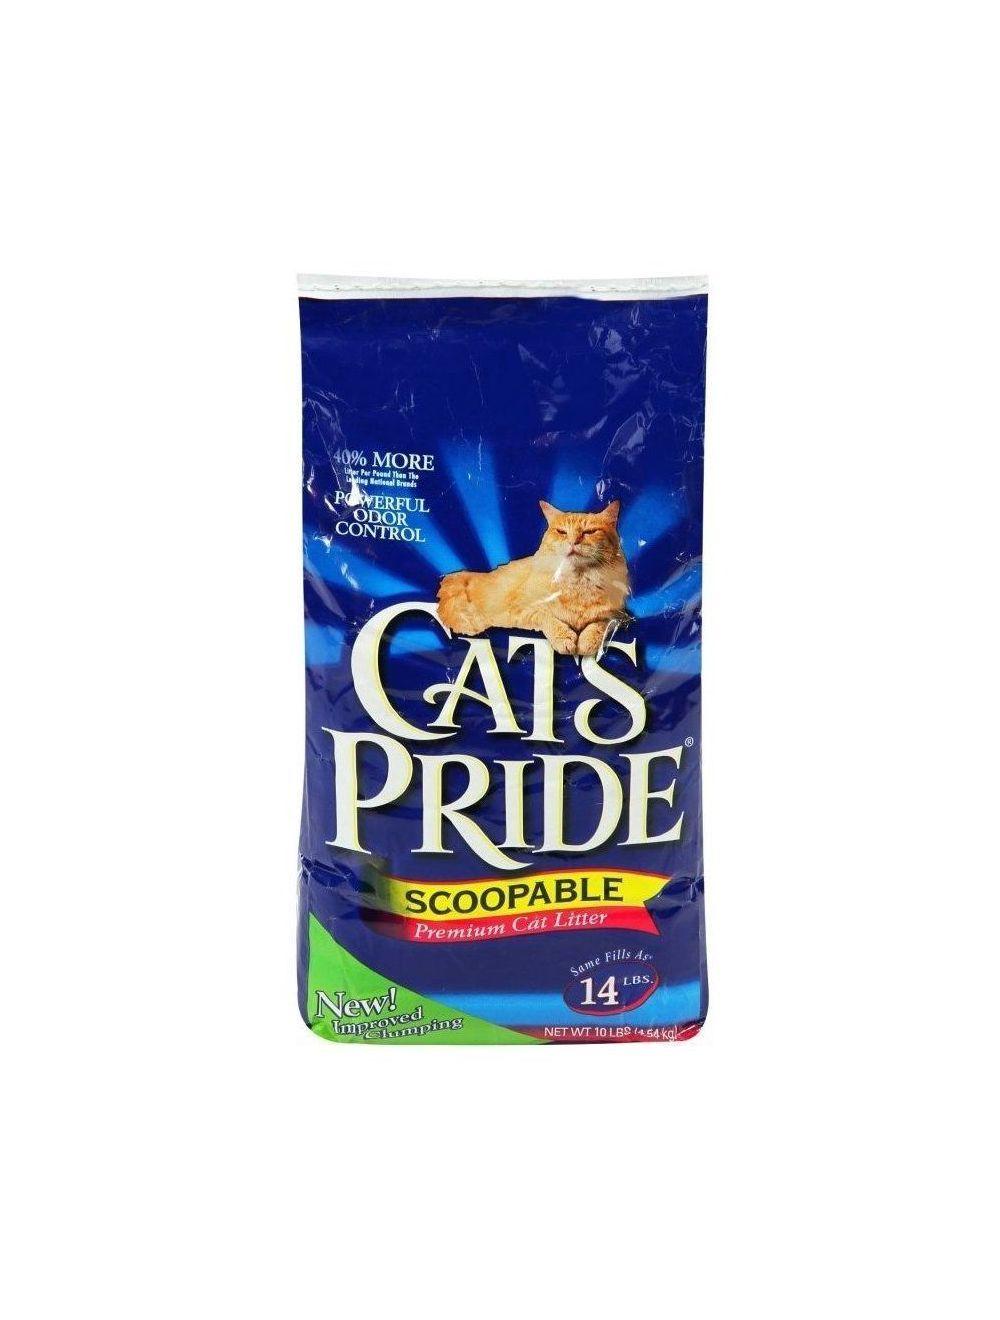 Cats Pride Premium Cat Litter Scoopable 9,07 kg